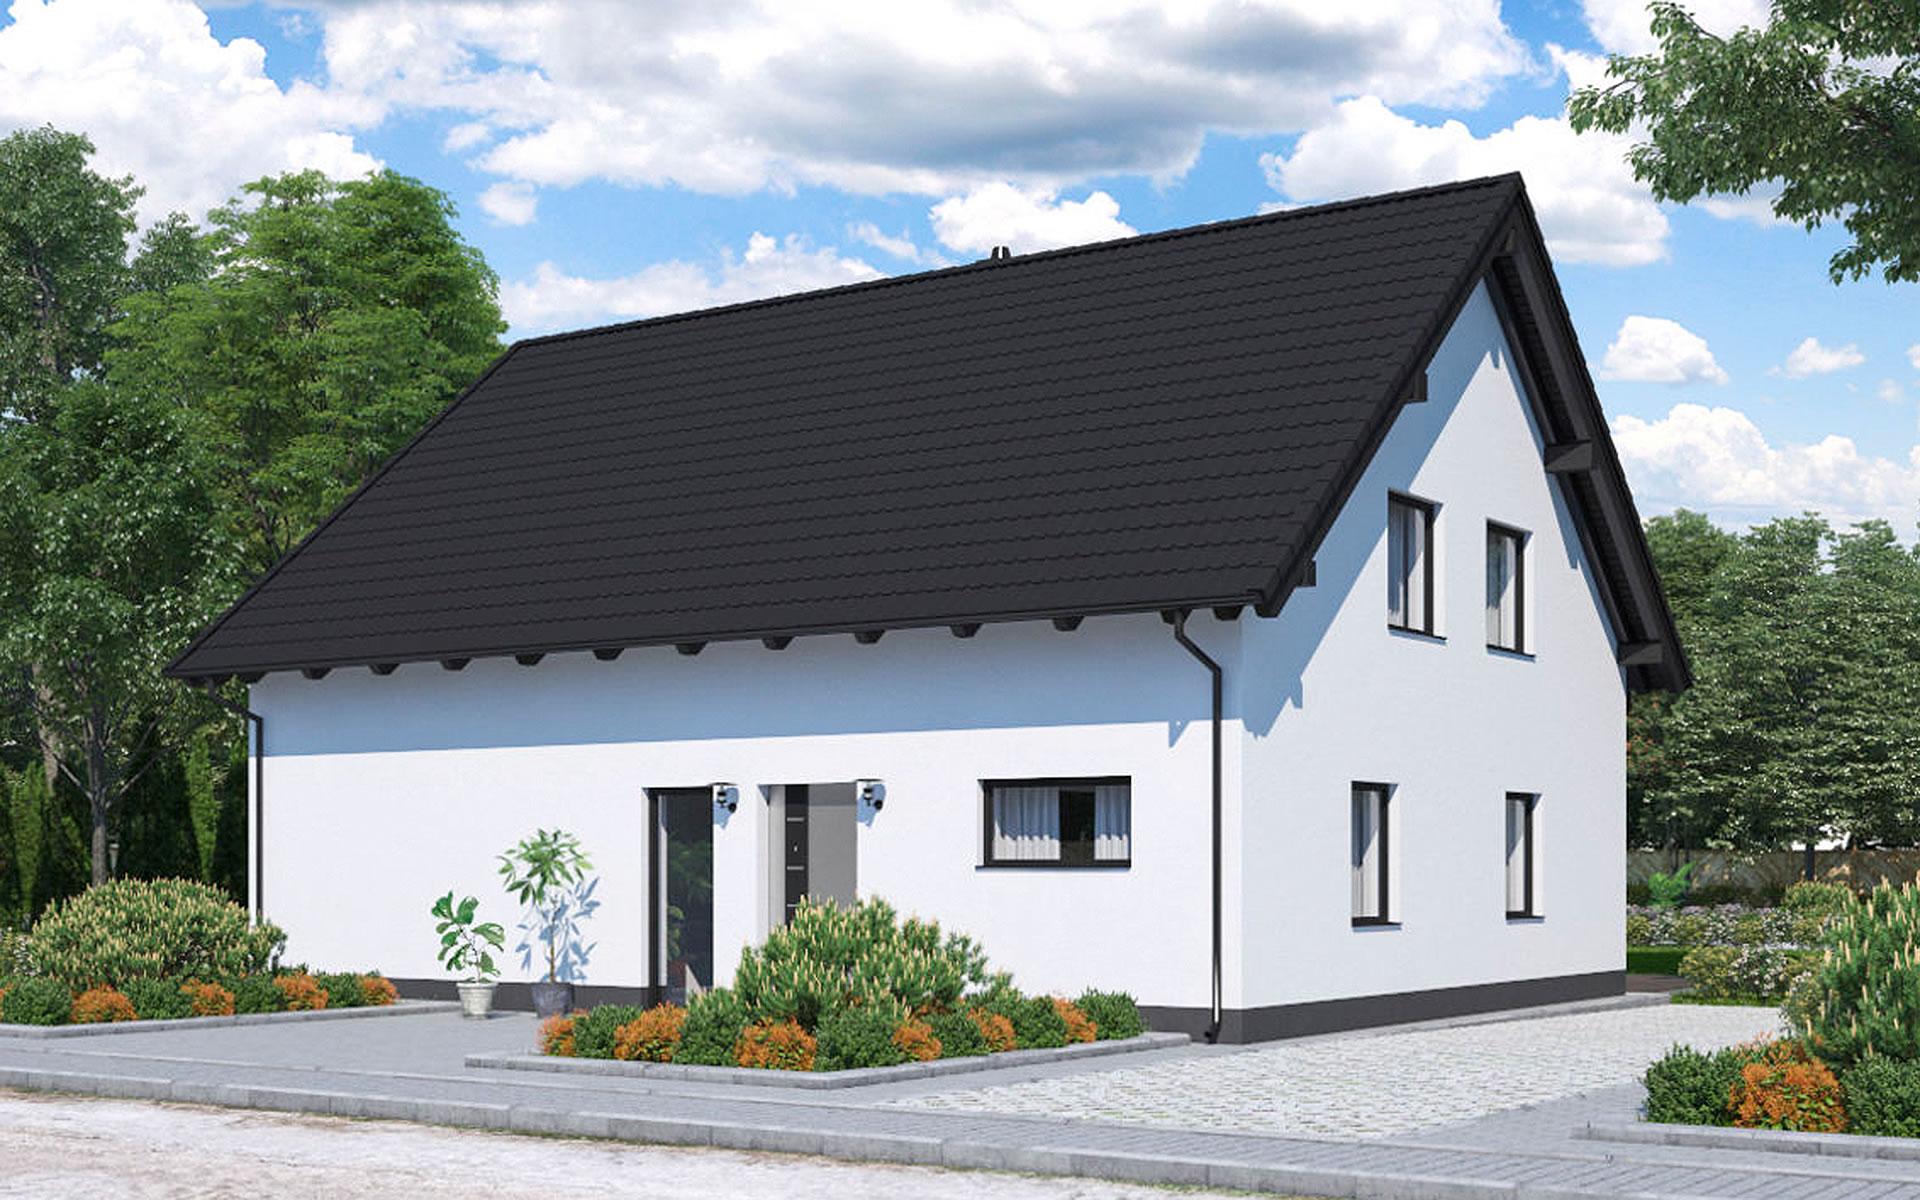 Zweifamilienhaus BS 140 - B&S Selbstbausysteme GmbH & Co. KG